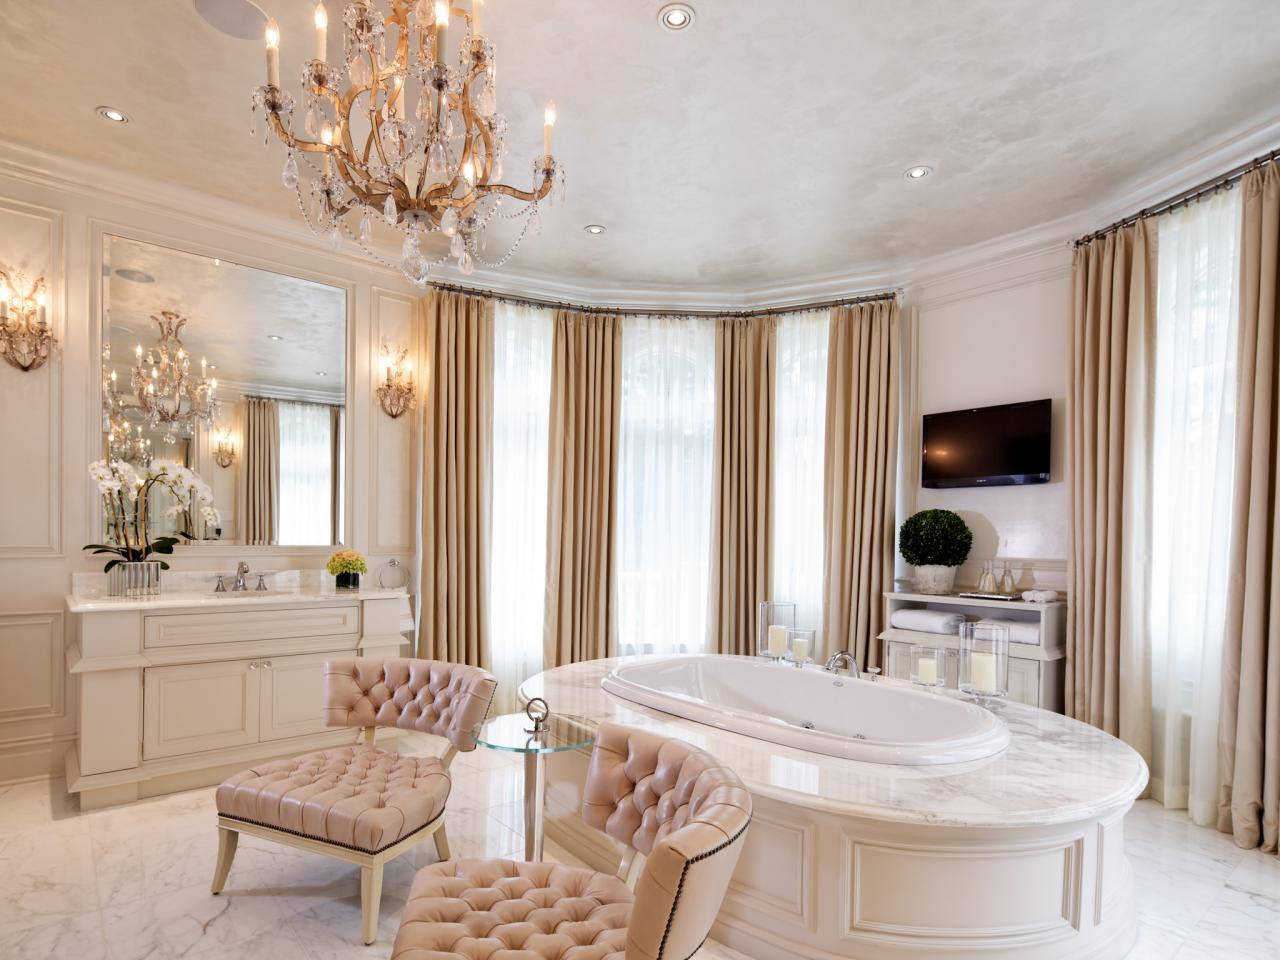 Pics Of Elegant Bathrooms 25 Decoration Inspiration